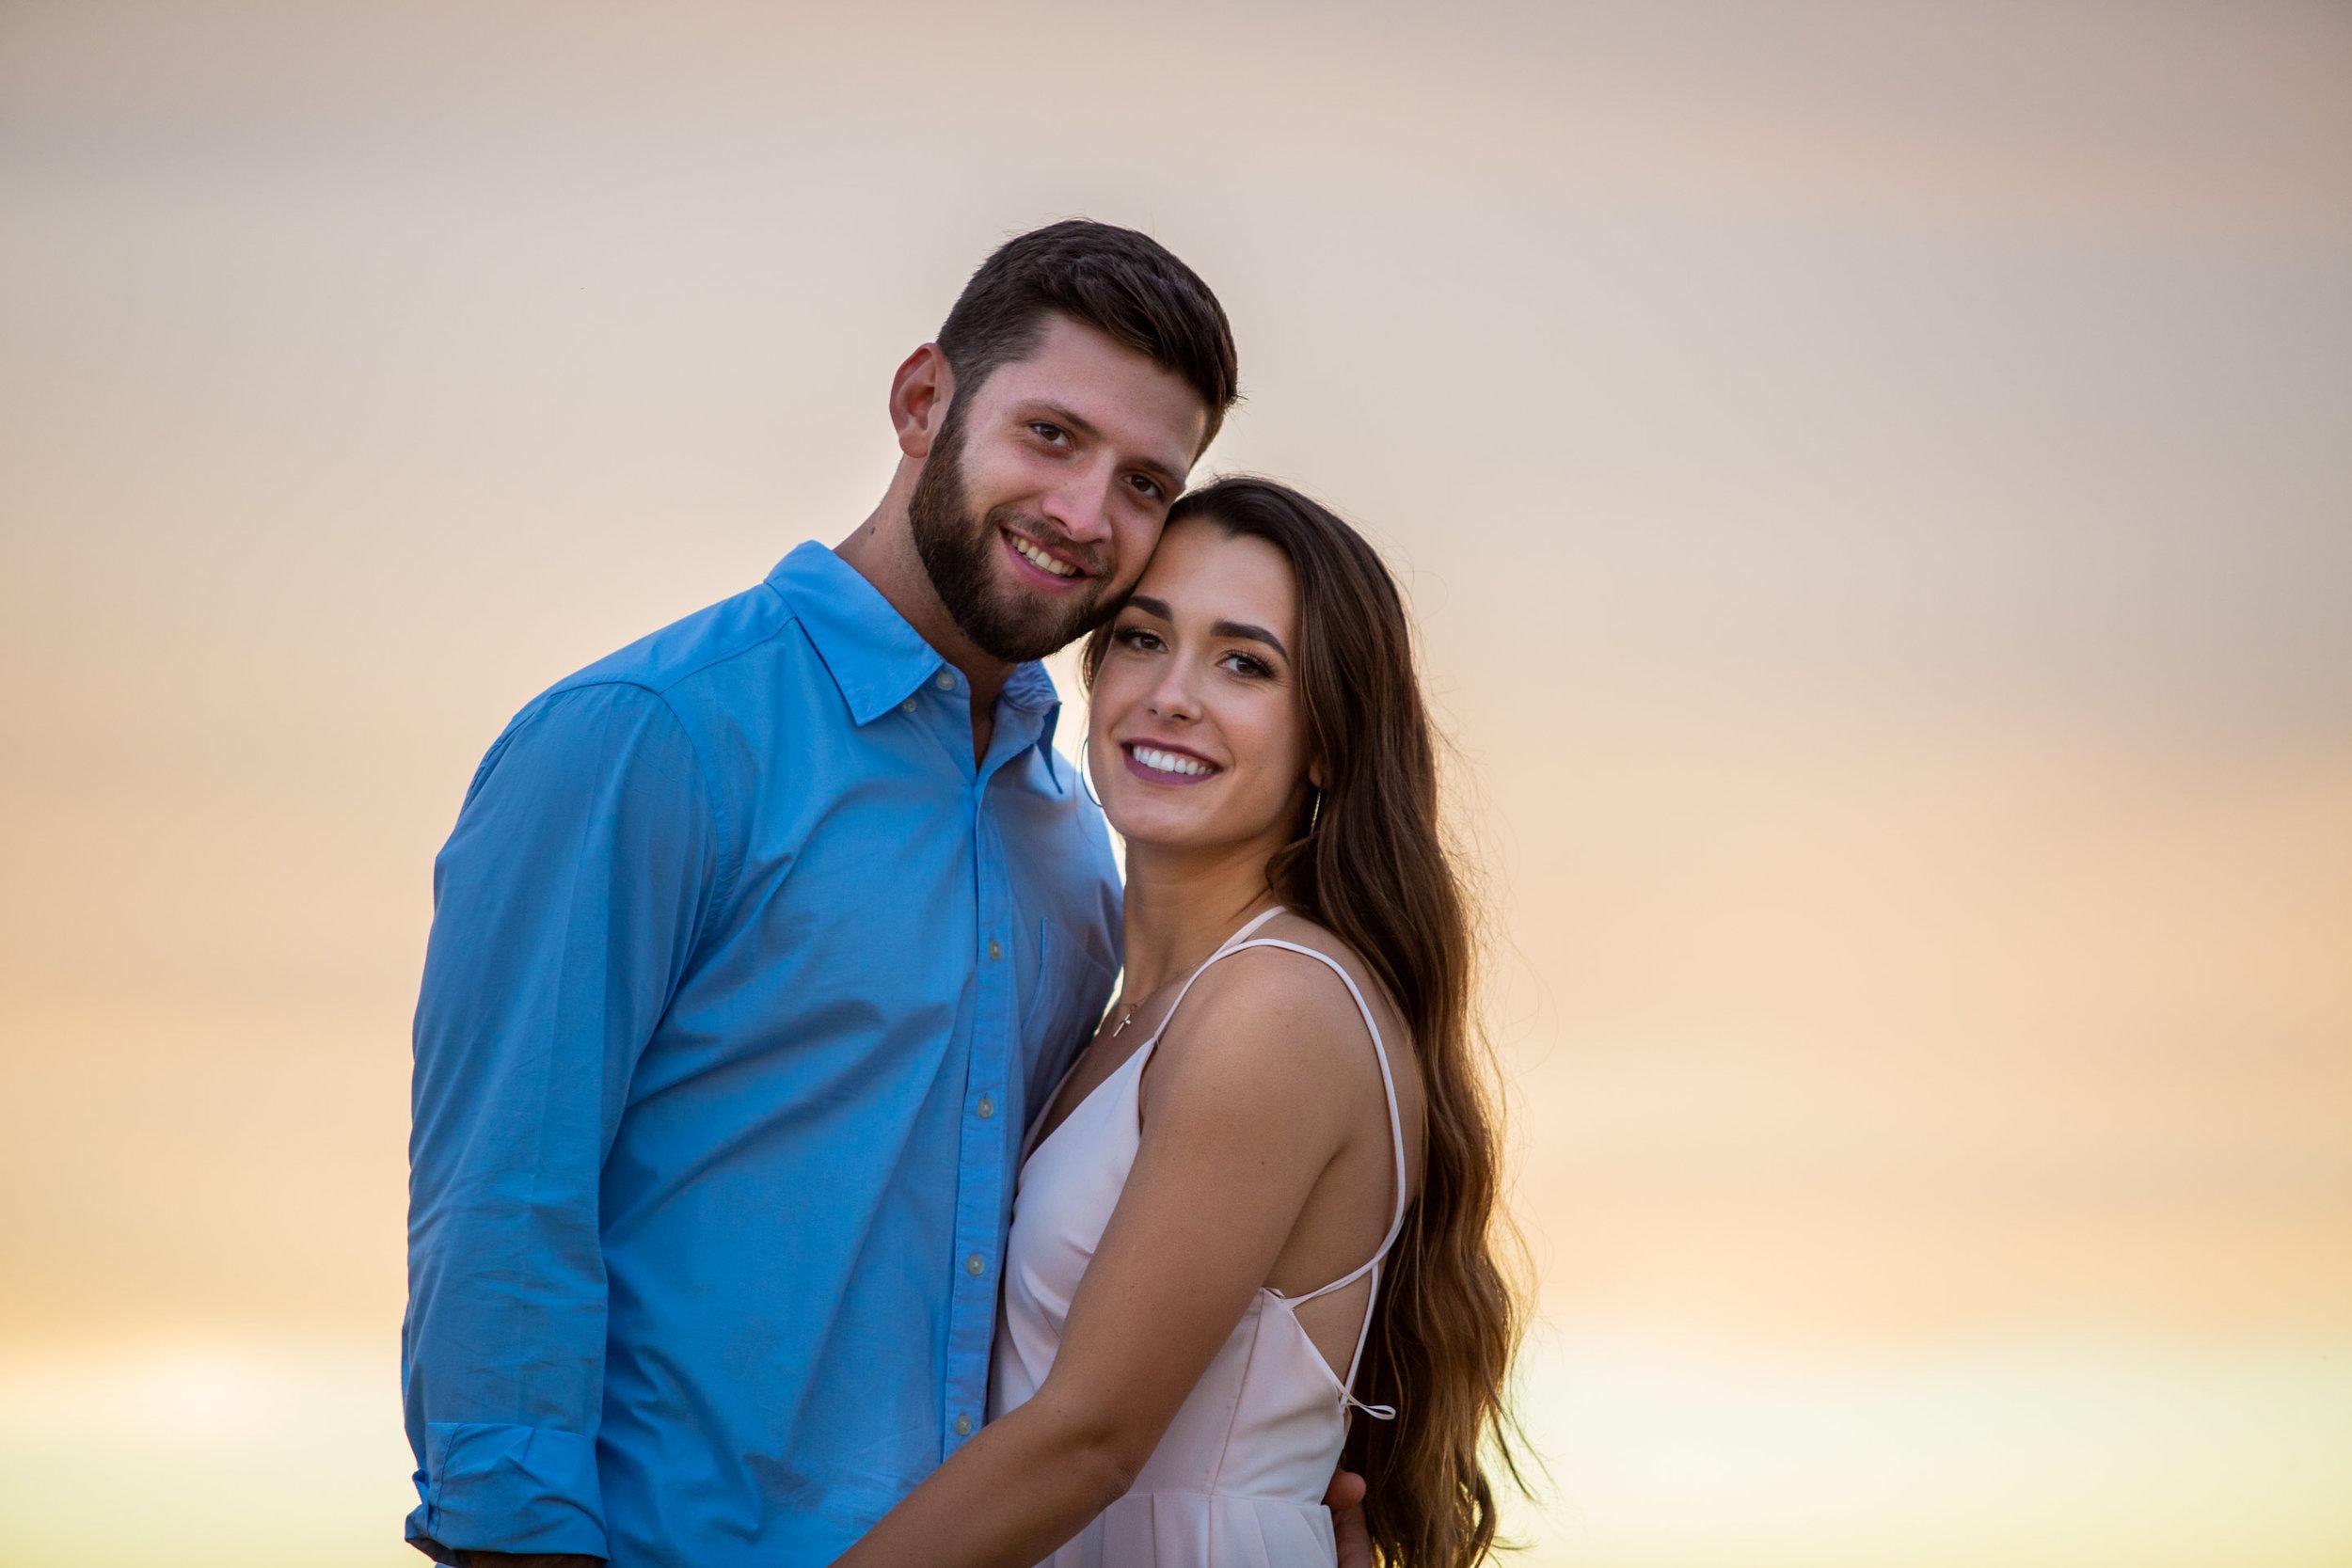 adam-szarmack-jacksonville-wedding-photographer-palm-coast-washing-oaks-garden-state-park-engagement-54.jpg